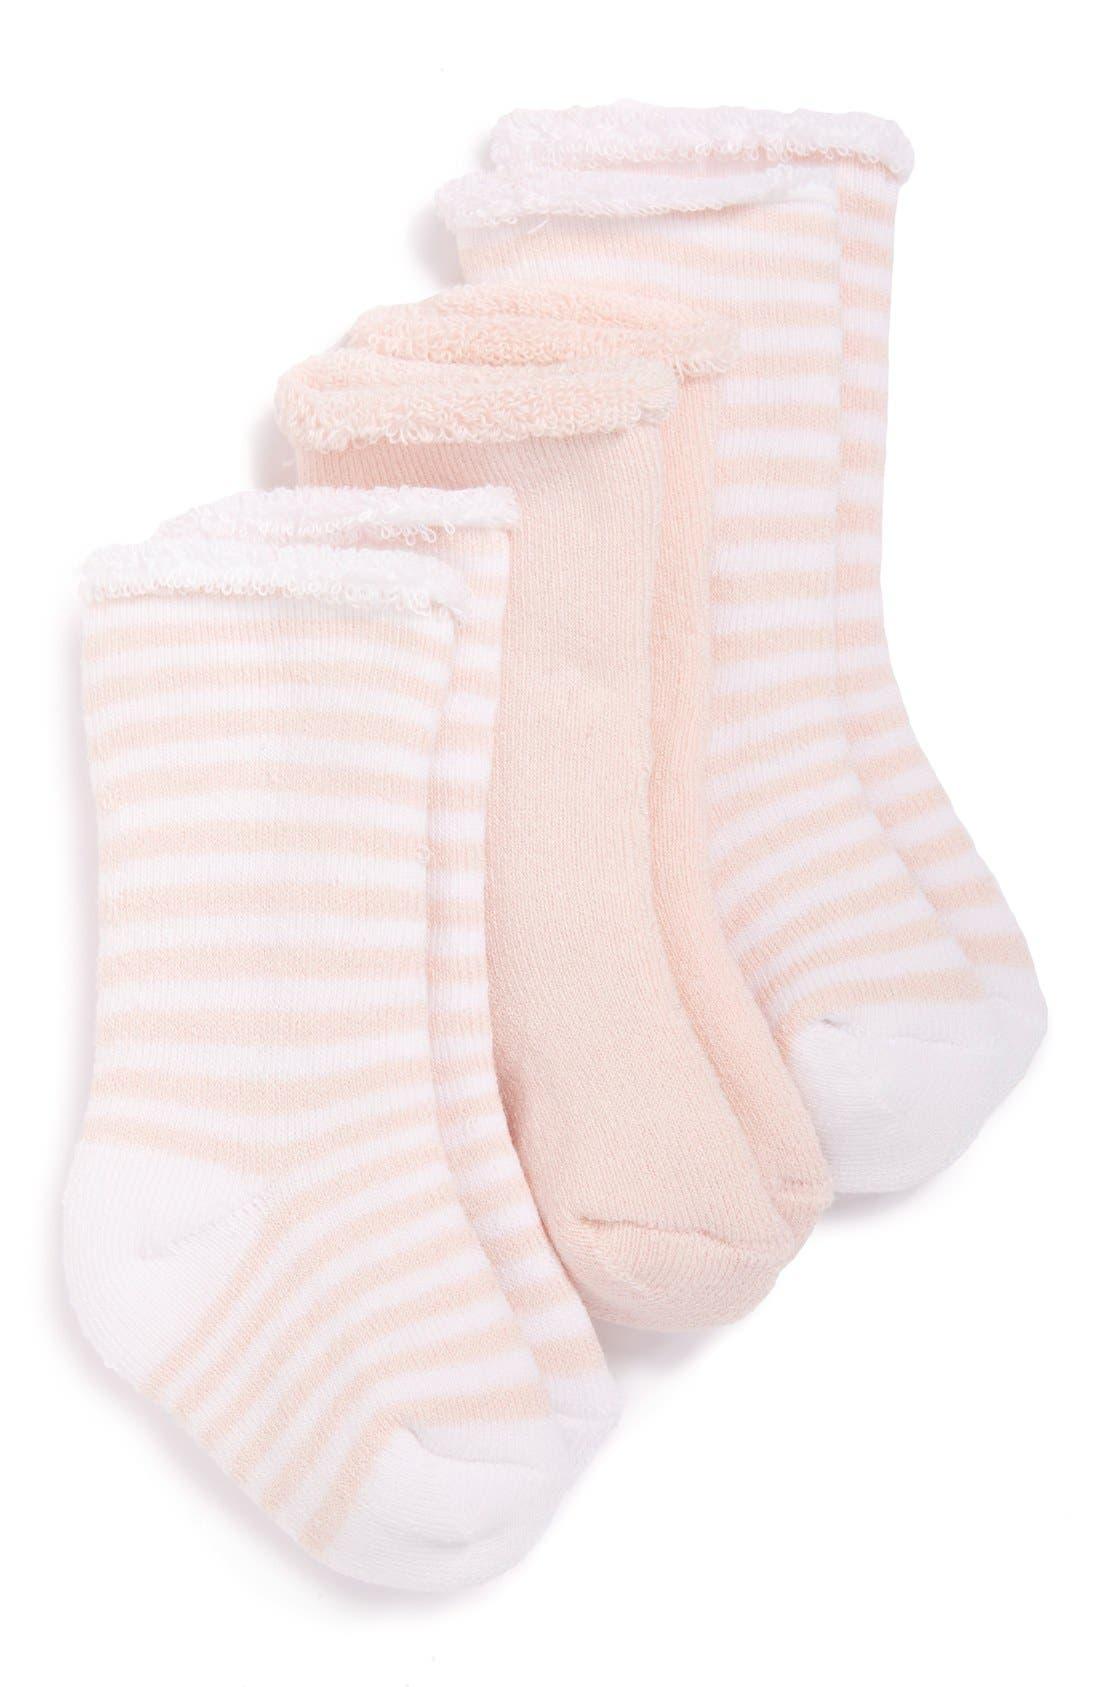 Nordstrom Baby 3-Pack Crew Socks (Baby)